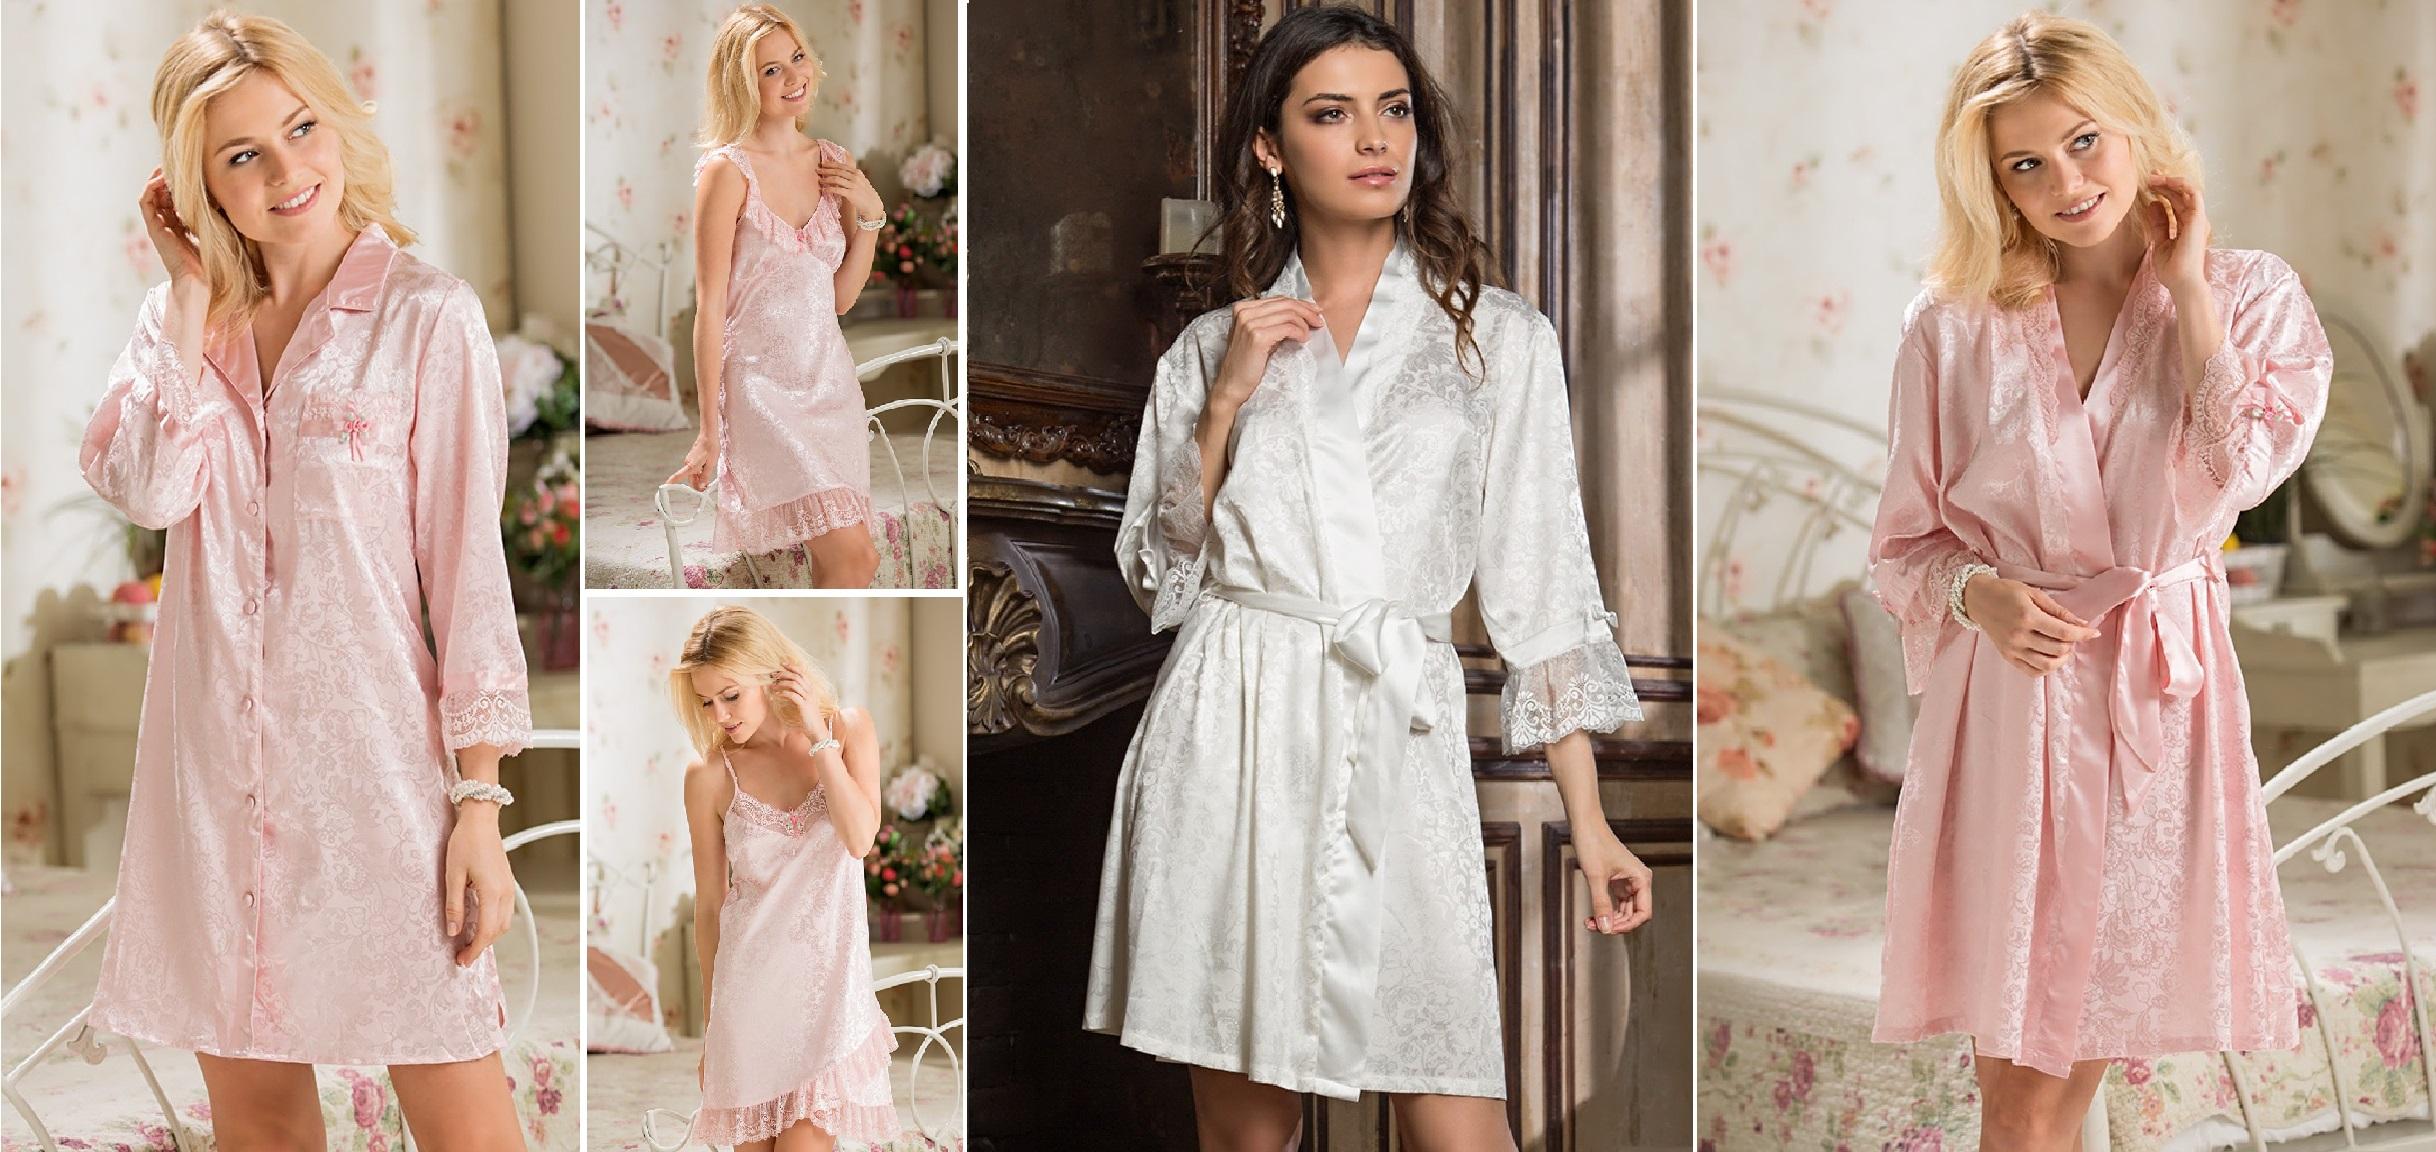 Женские сорочки, халаты, комплекты и пижамы Angelina Mia-Mia купить интернет-магазин